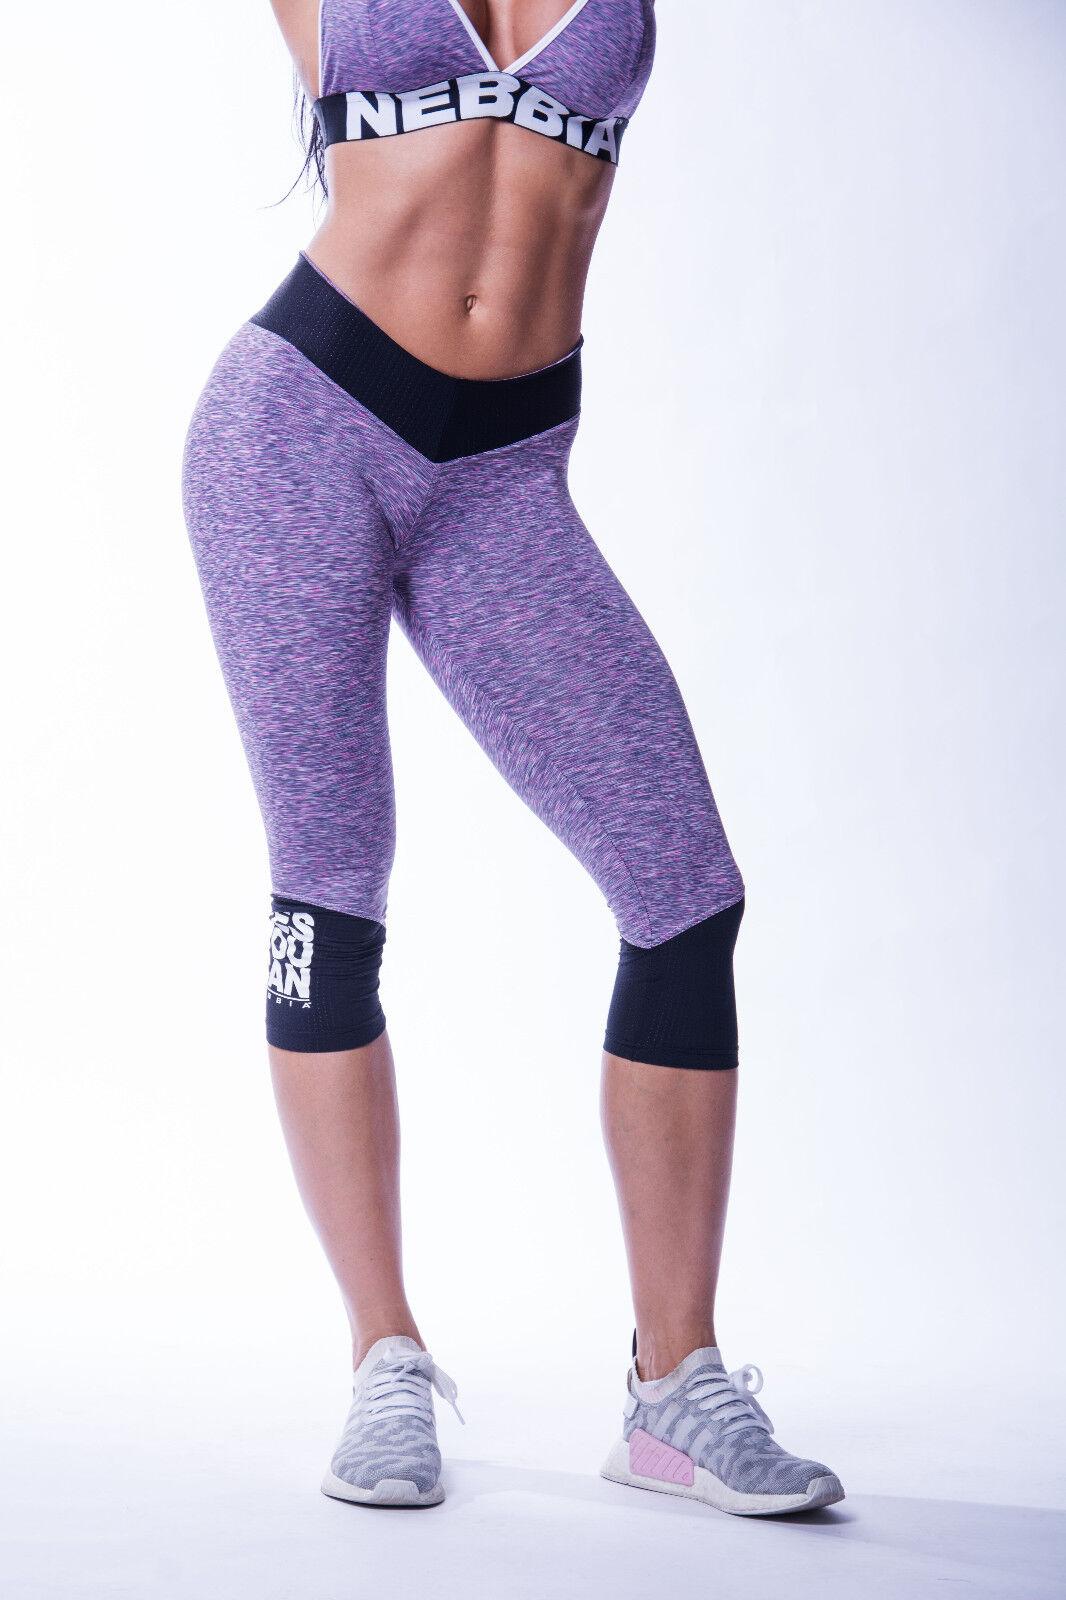 NEBBIA High waist ¾ ¾ waist leggings 607 b3c161